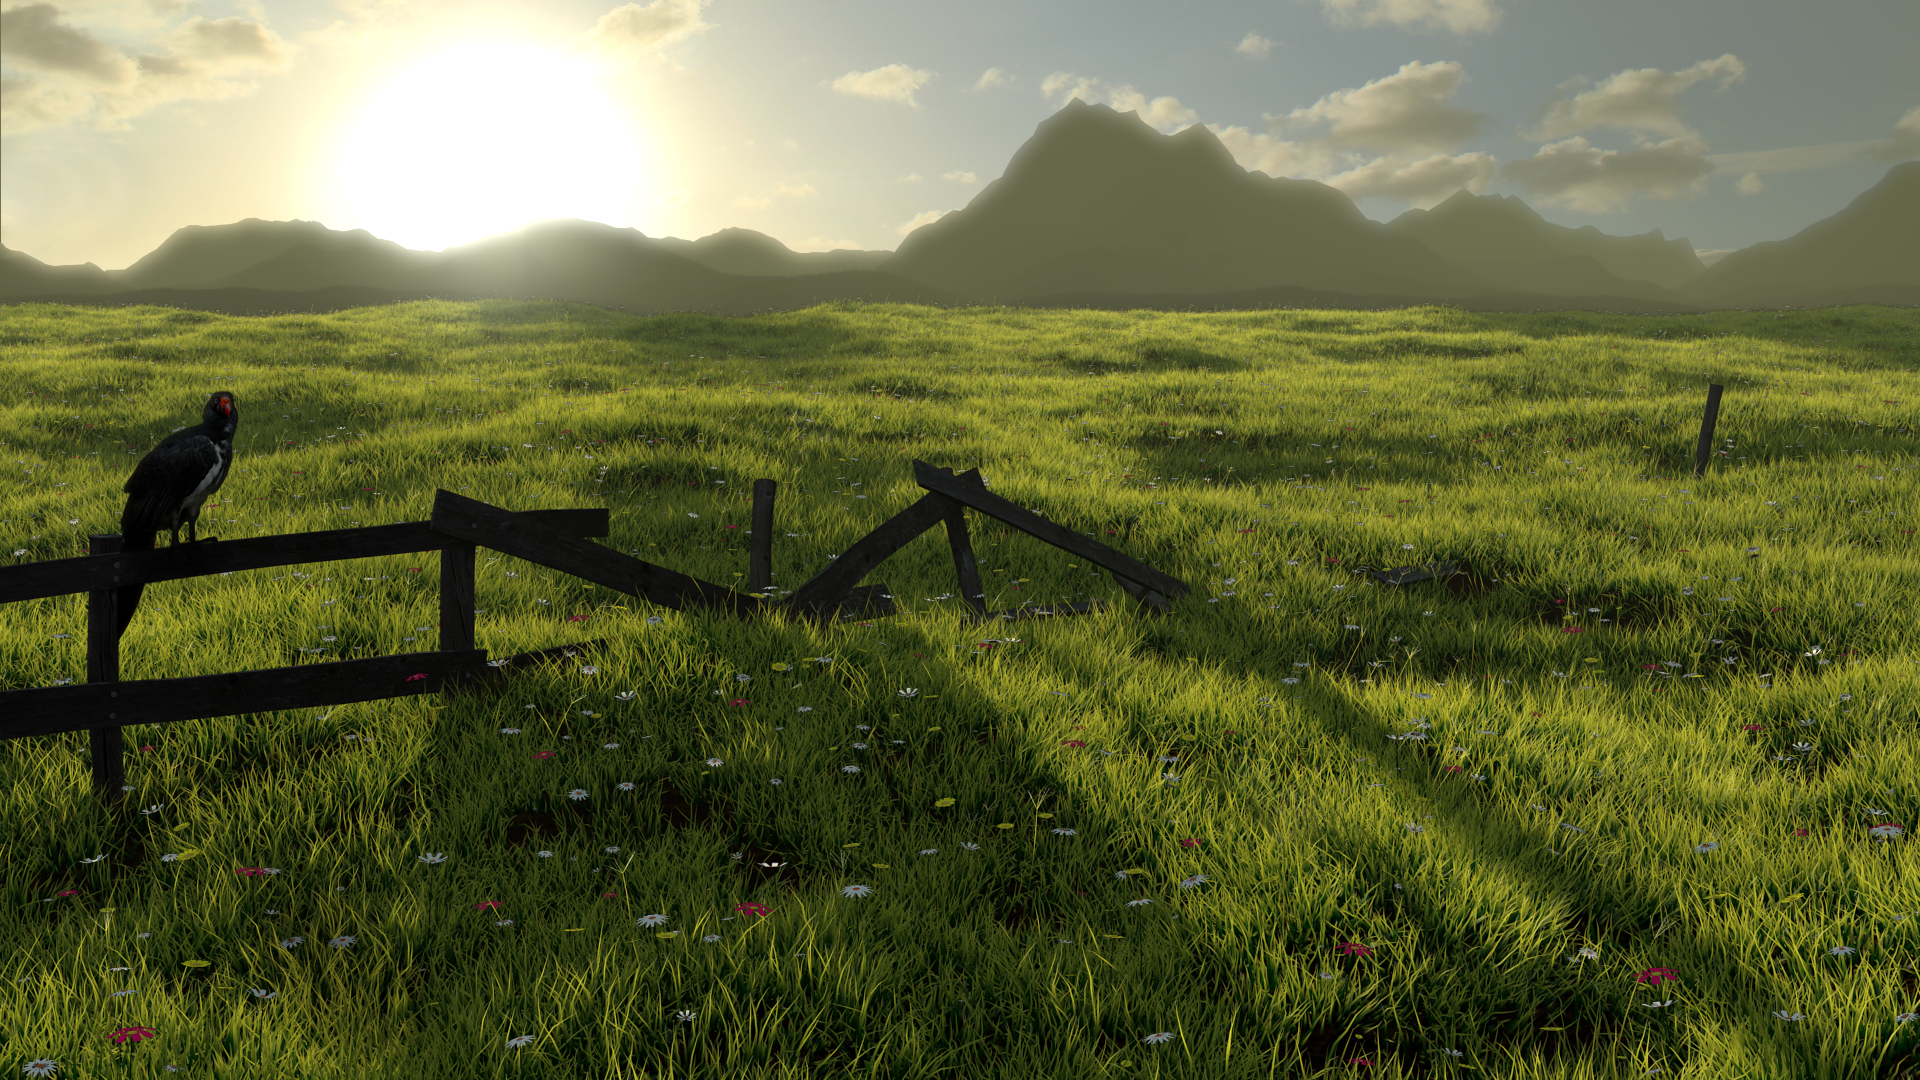 Grassy Field By Jarwal On DeviantArt